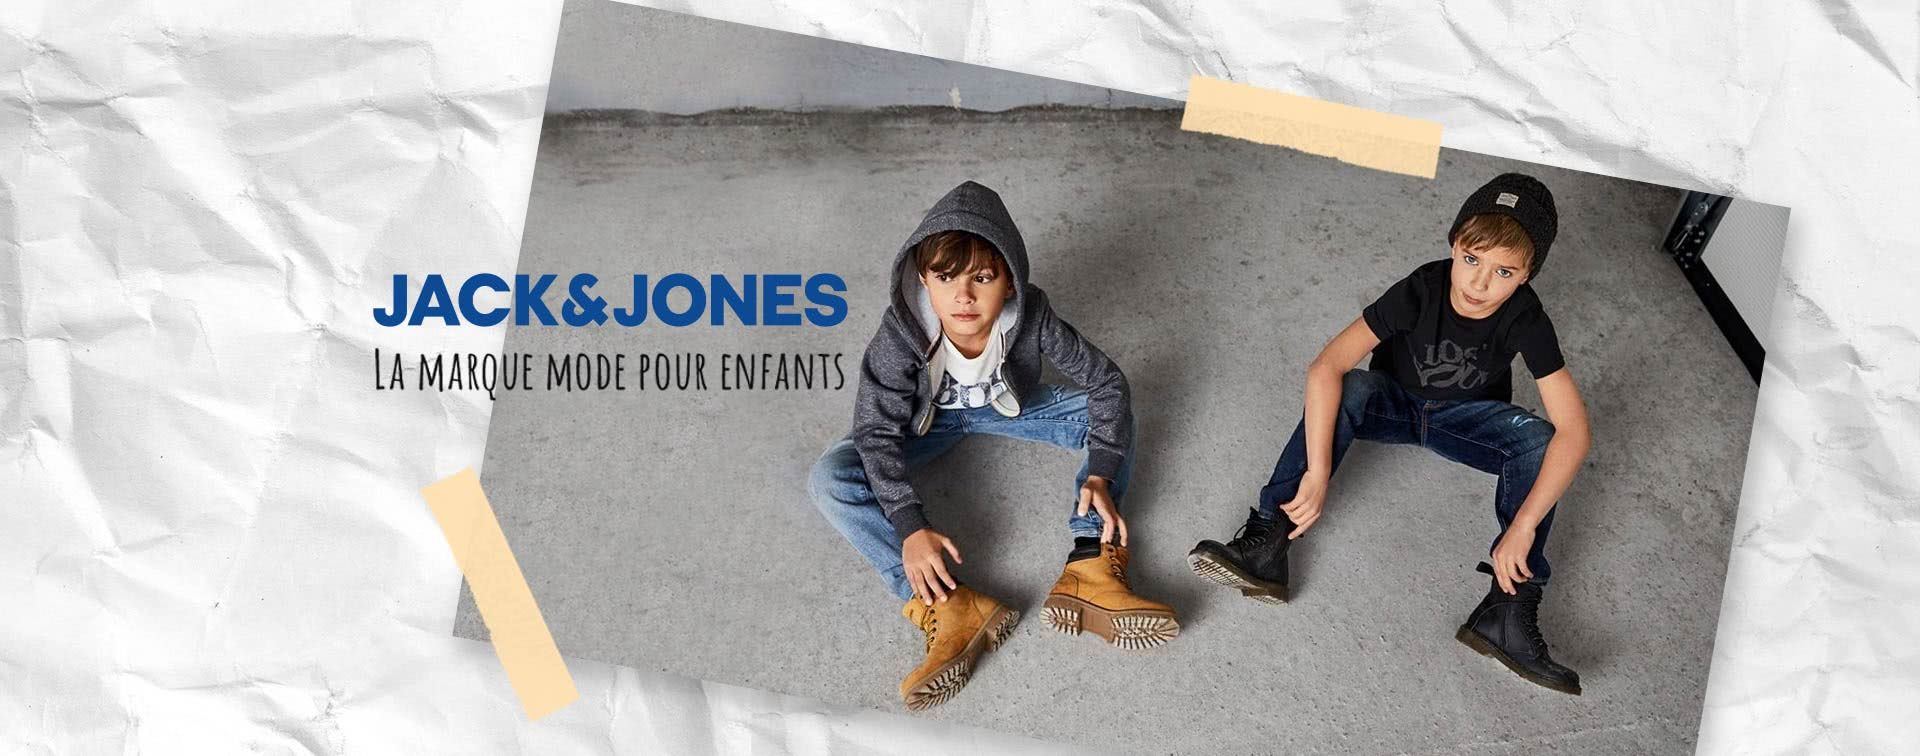 Jack and Jones Enfants